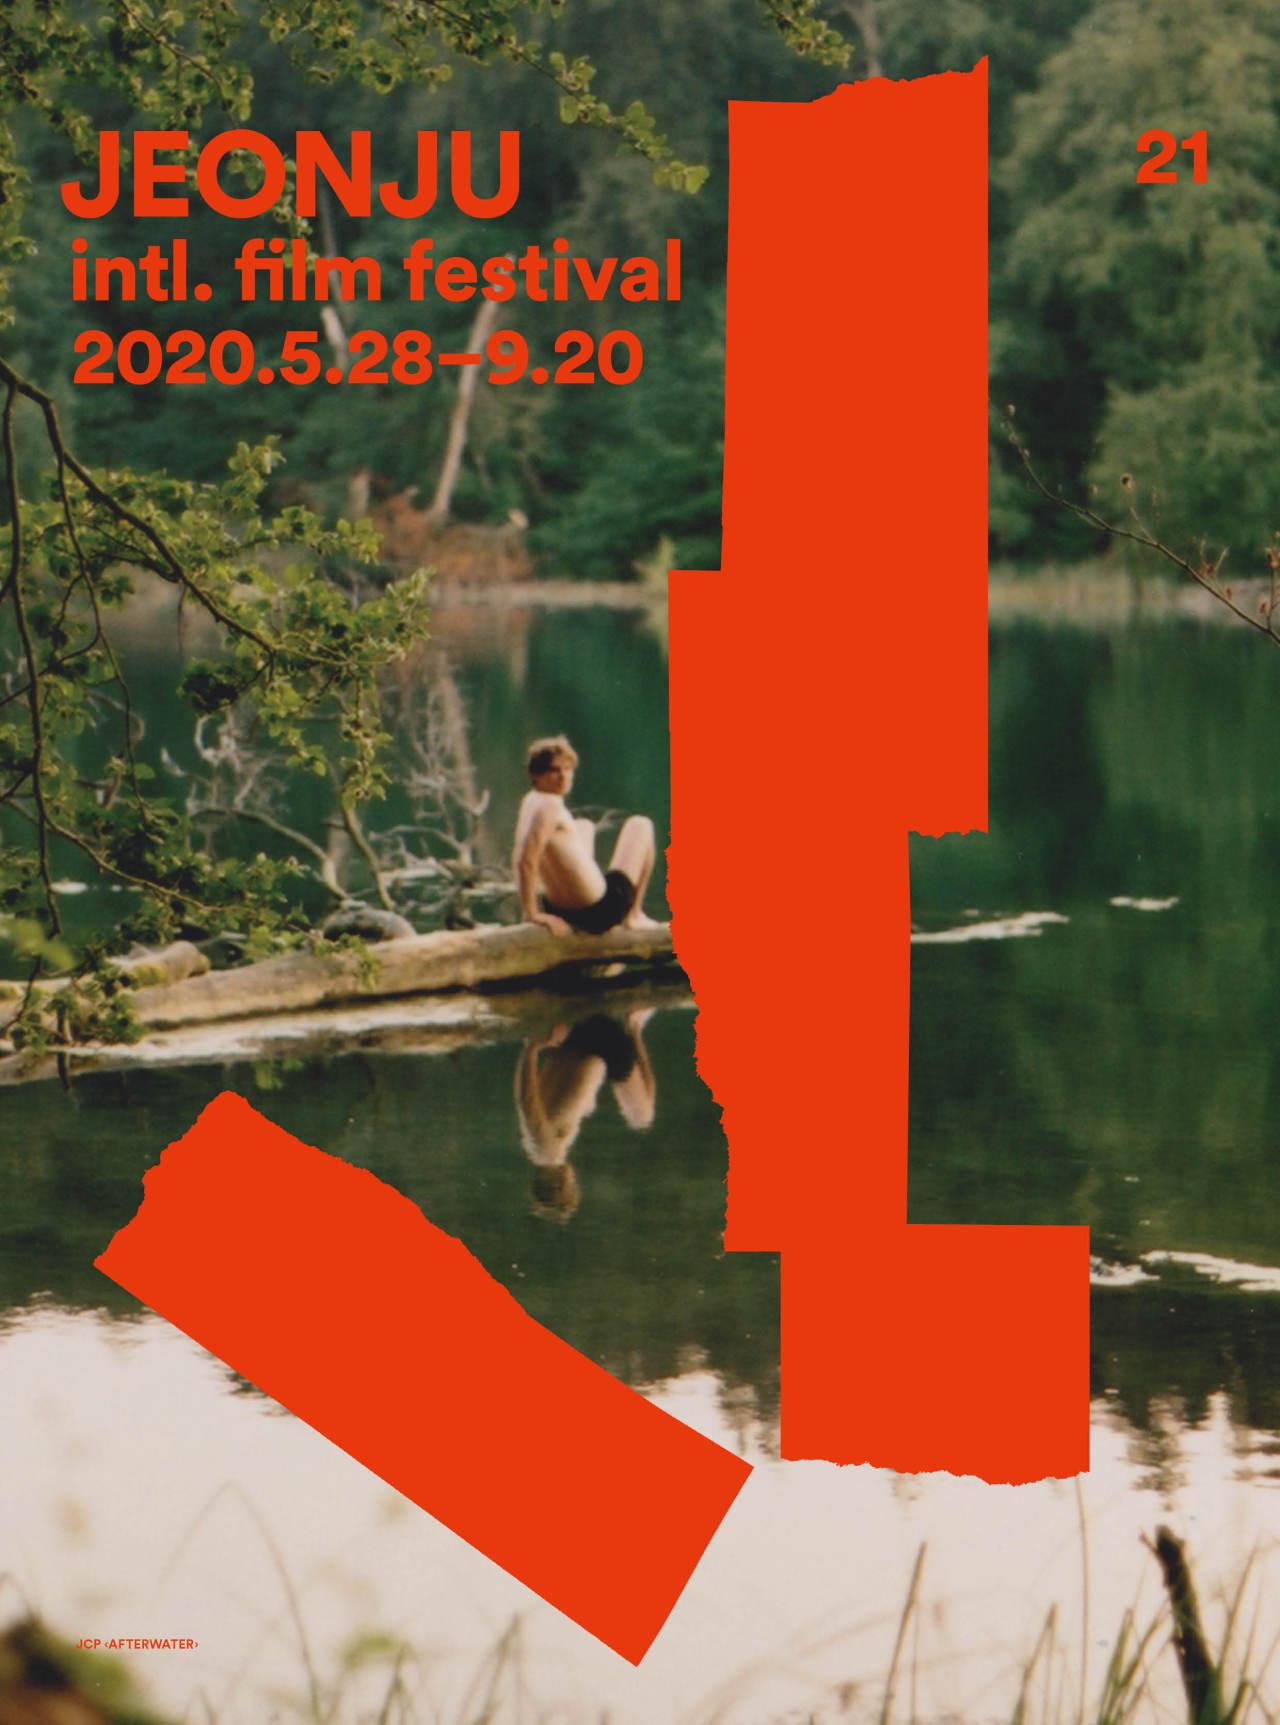 The 21st Jeonju International Film Festival poster (Jeonju IFF)